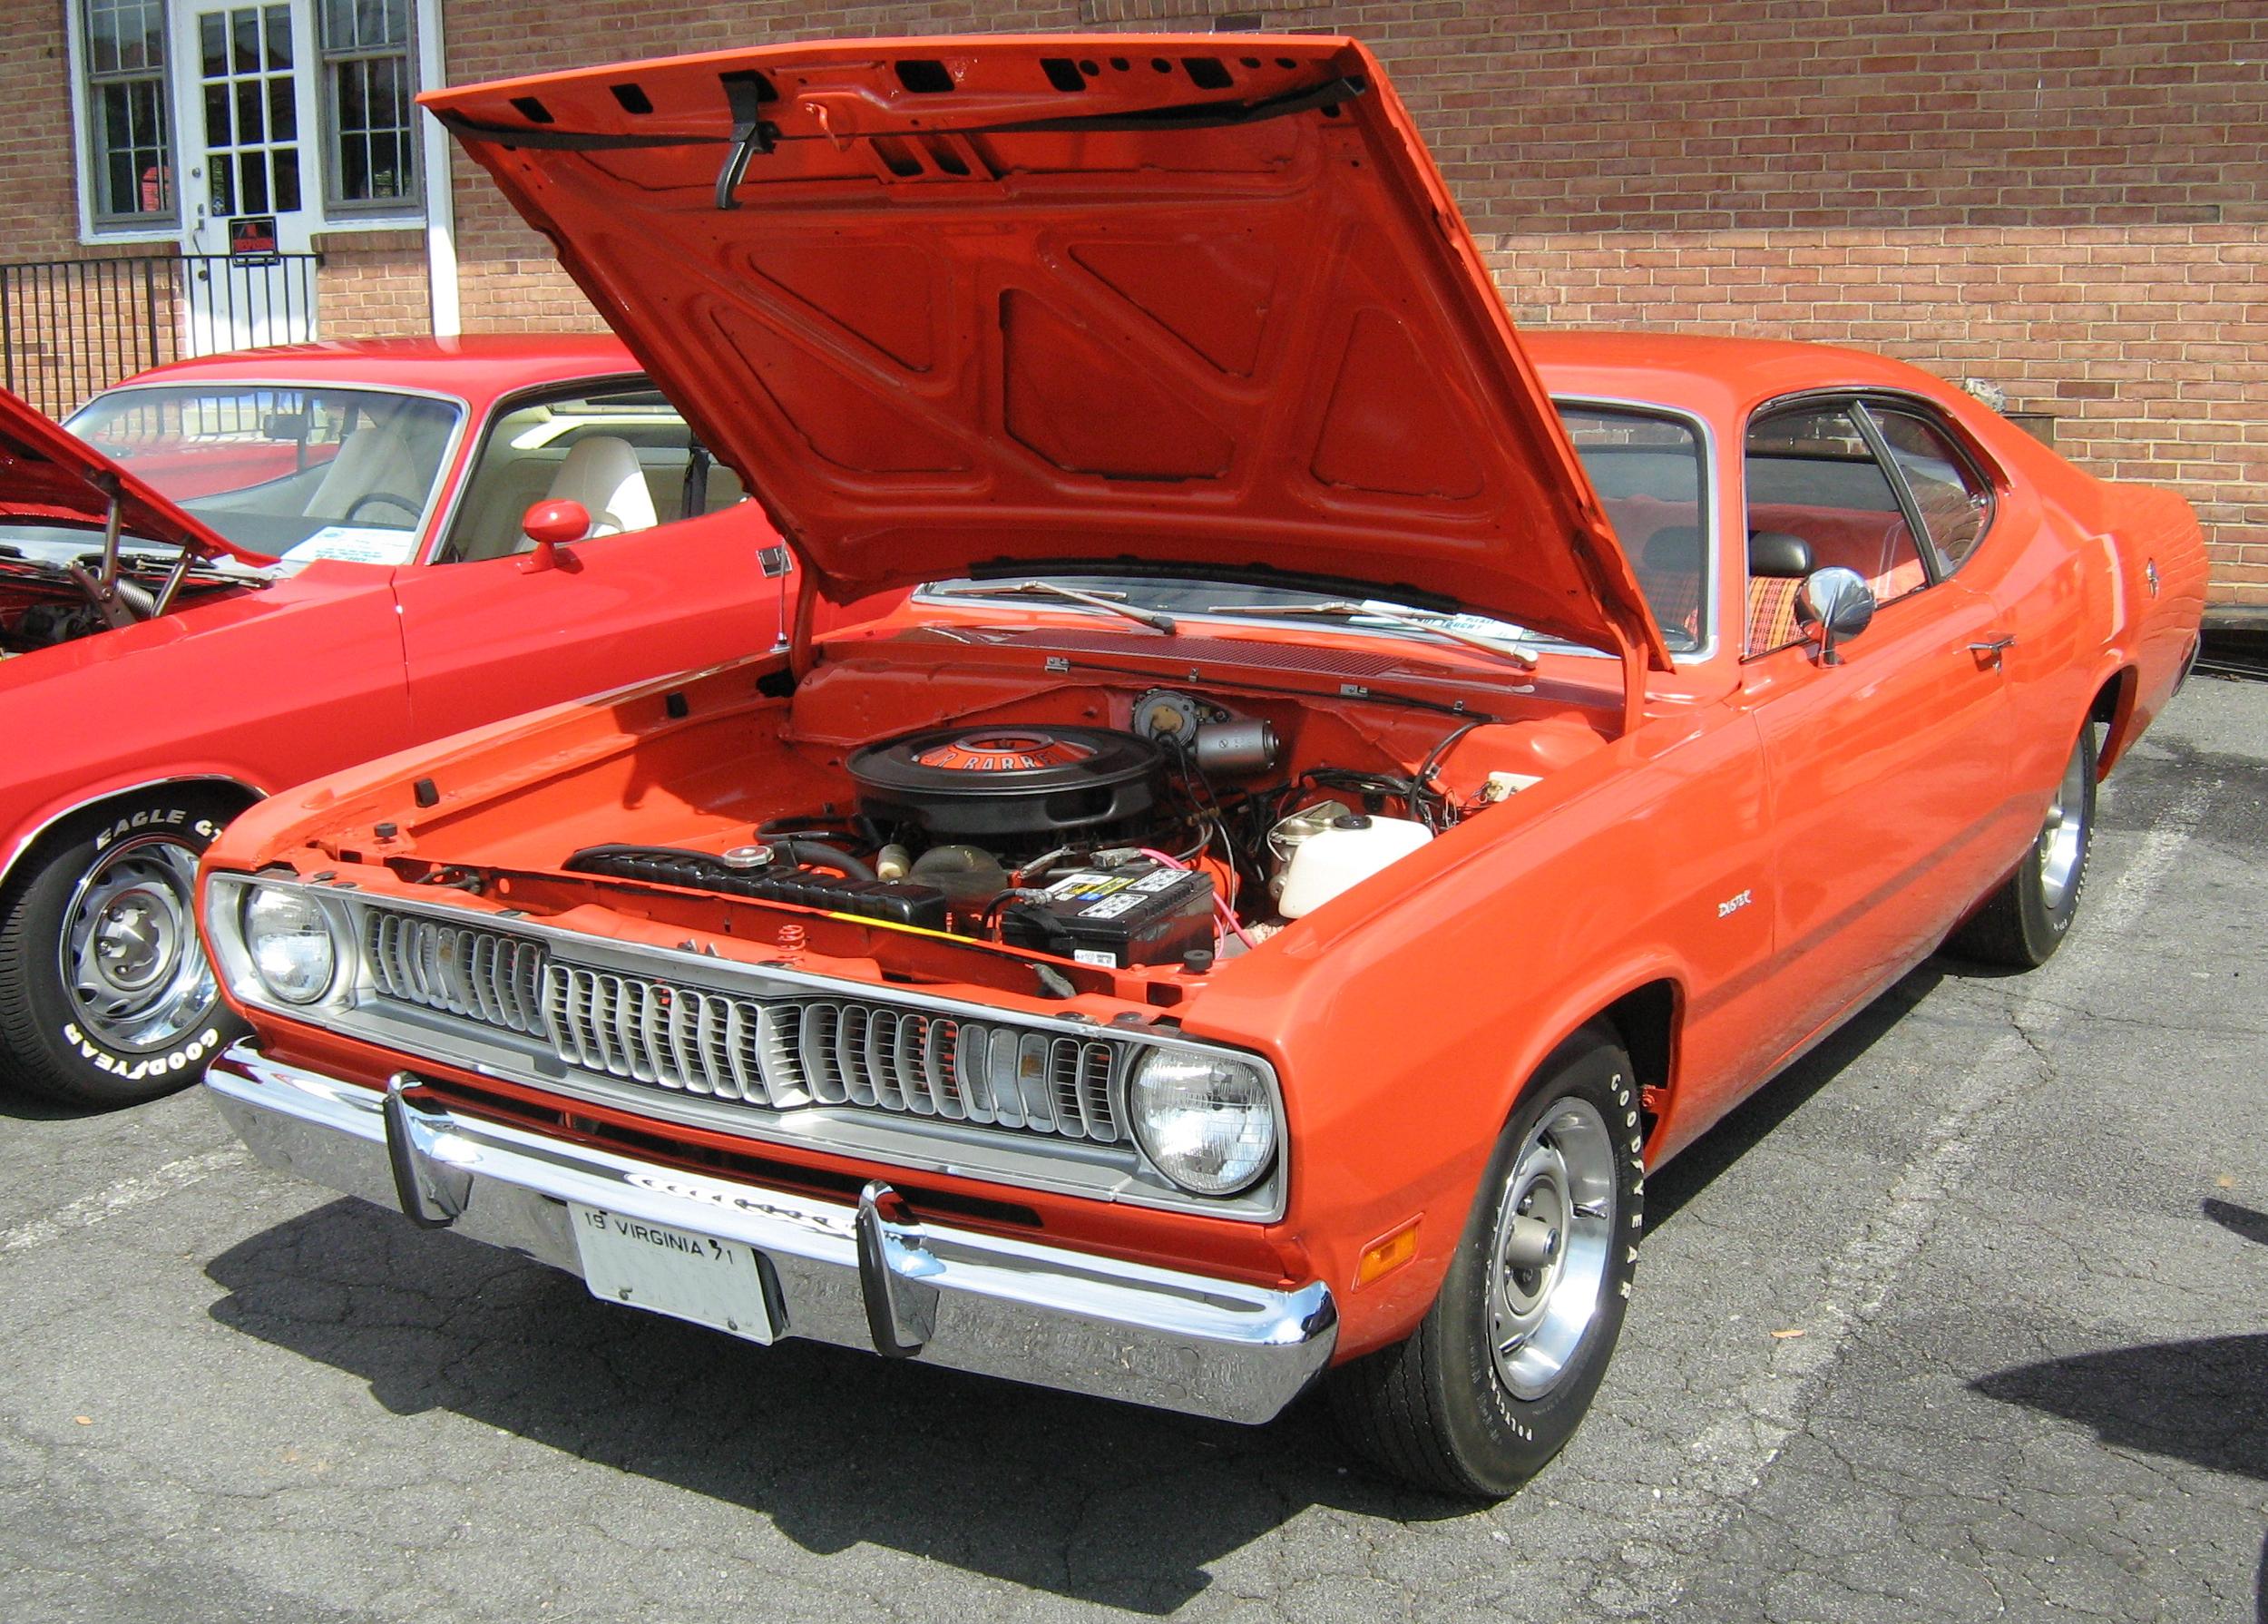 1971_Plymouth_Duster_Orange_va-f.jpg